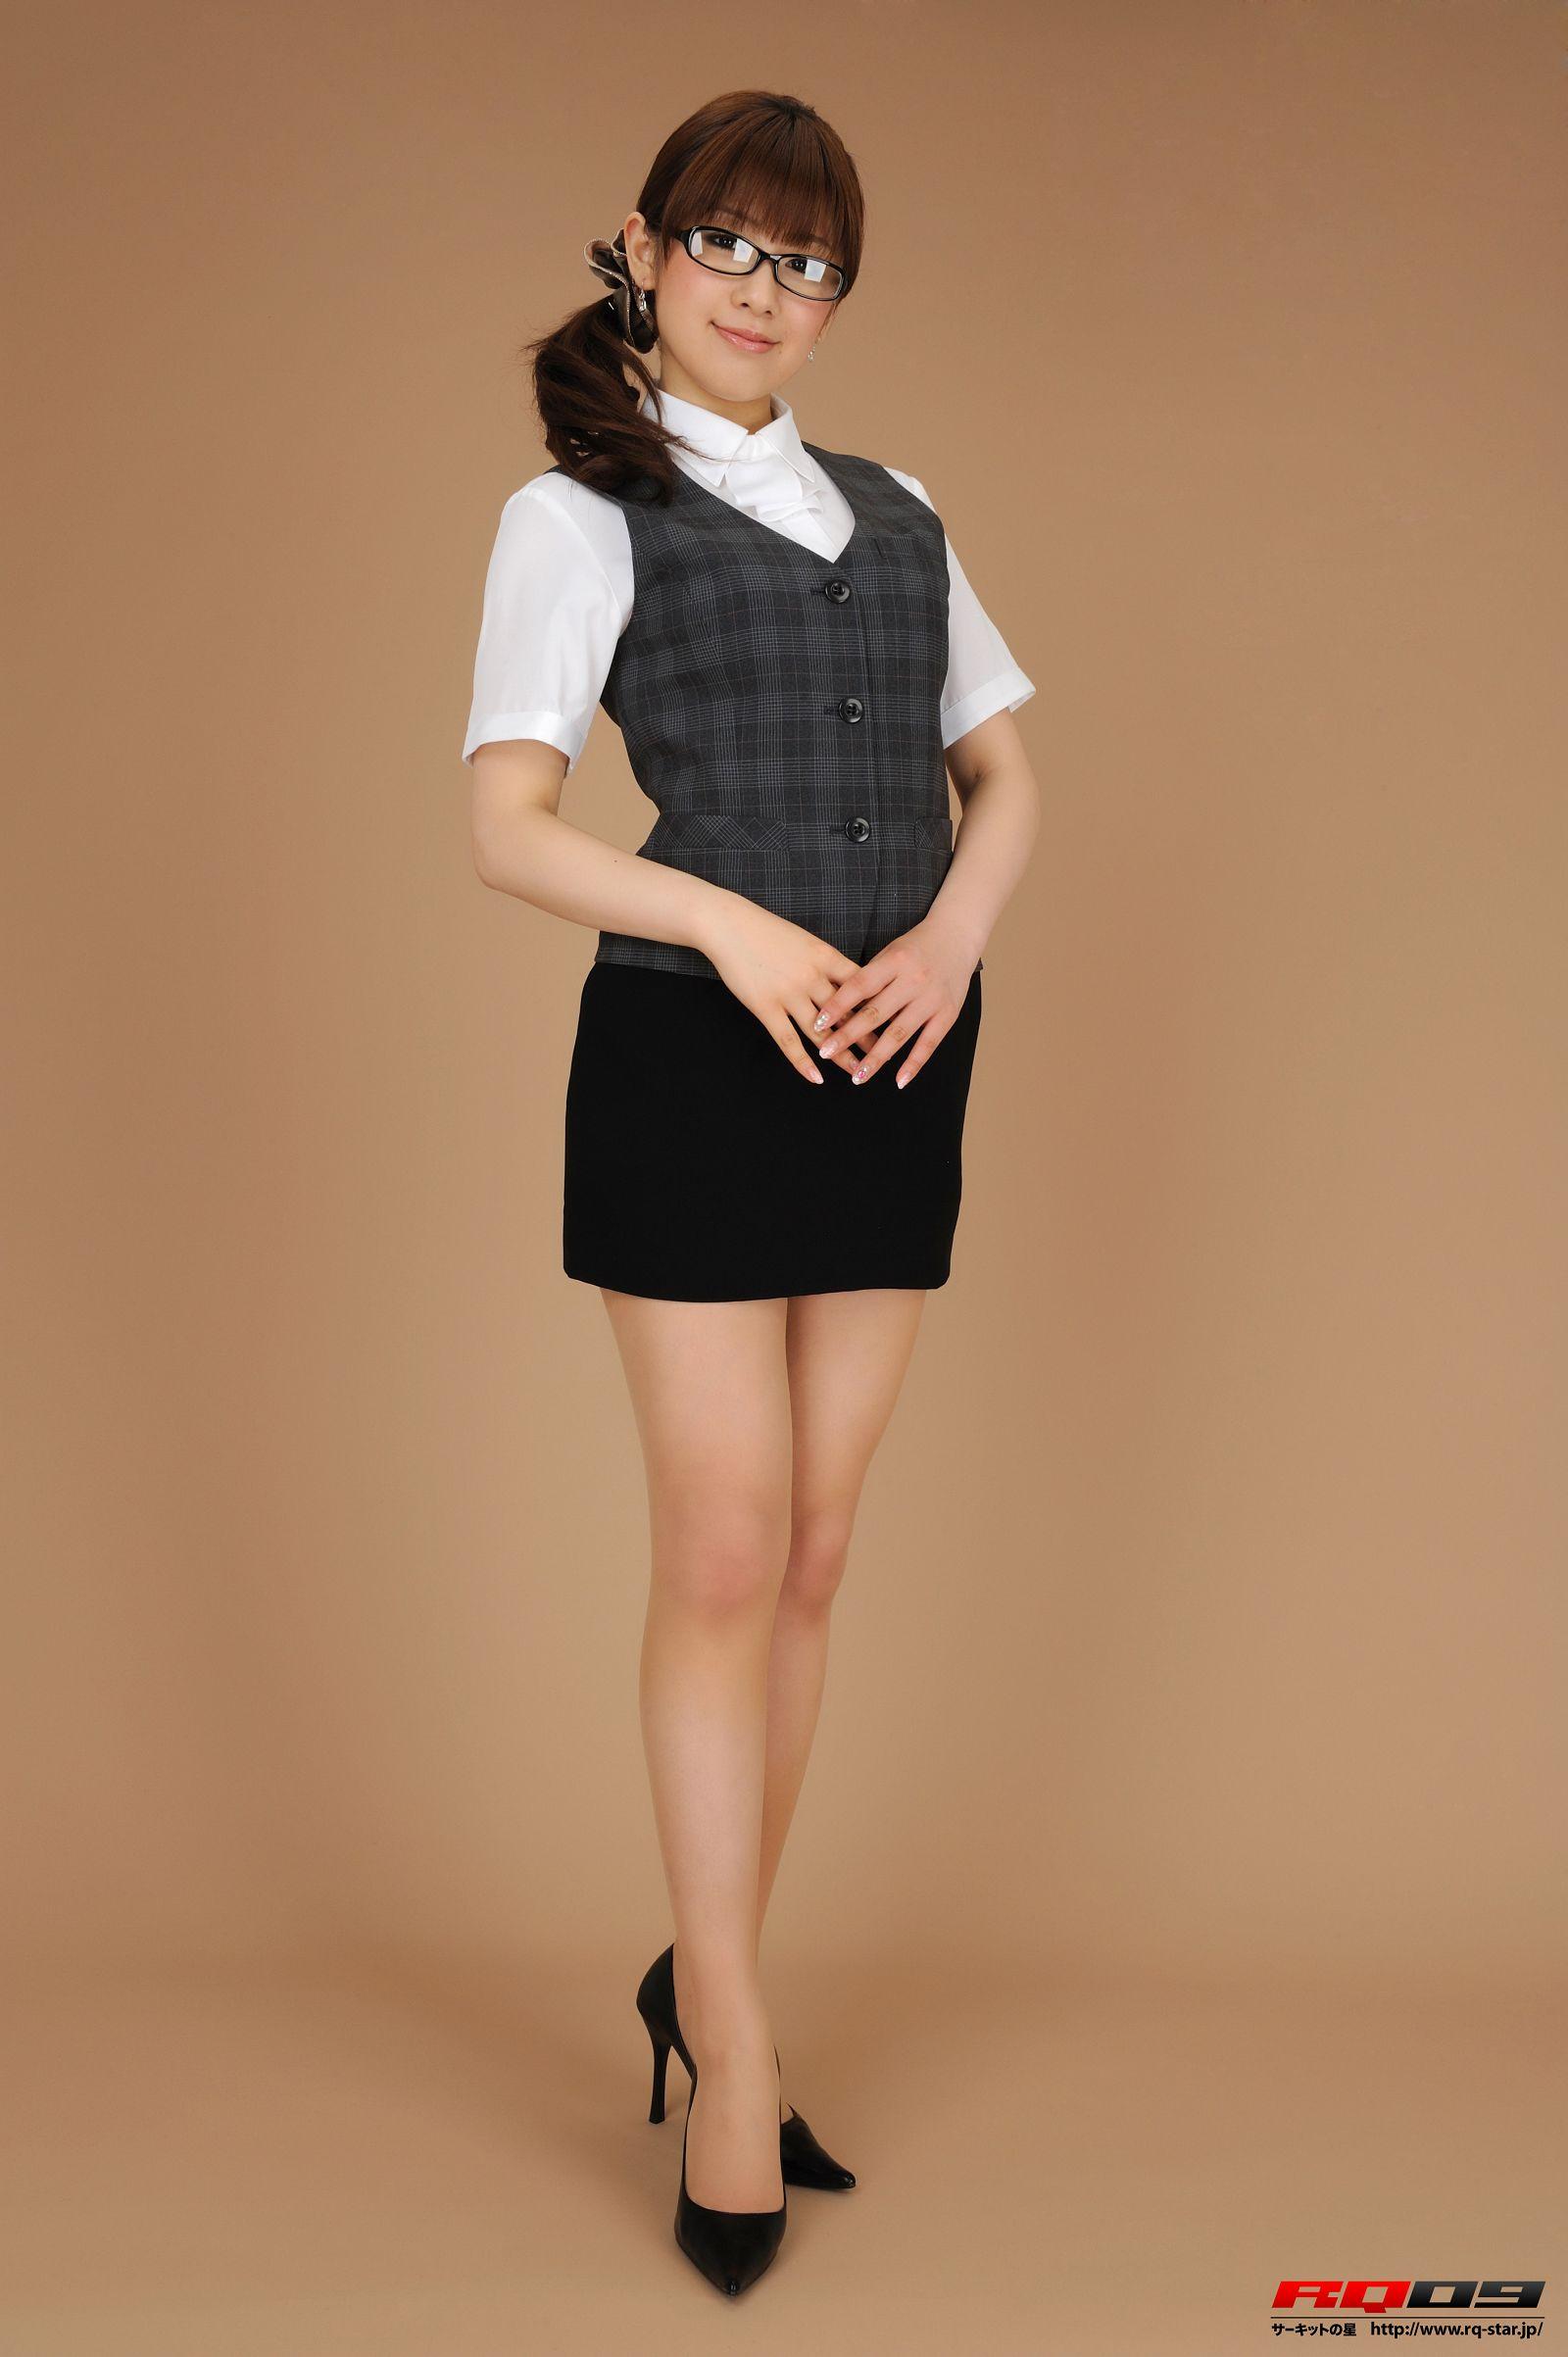 [RQ STAR美女] NO.0179 Chika Tohno 遠野千夏 Office Lady[120P] RQ STAR 第1张